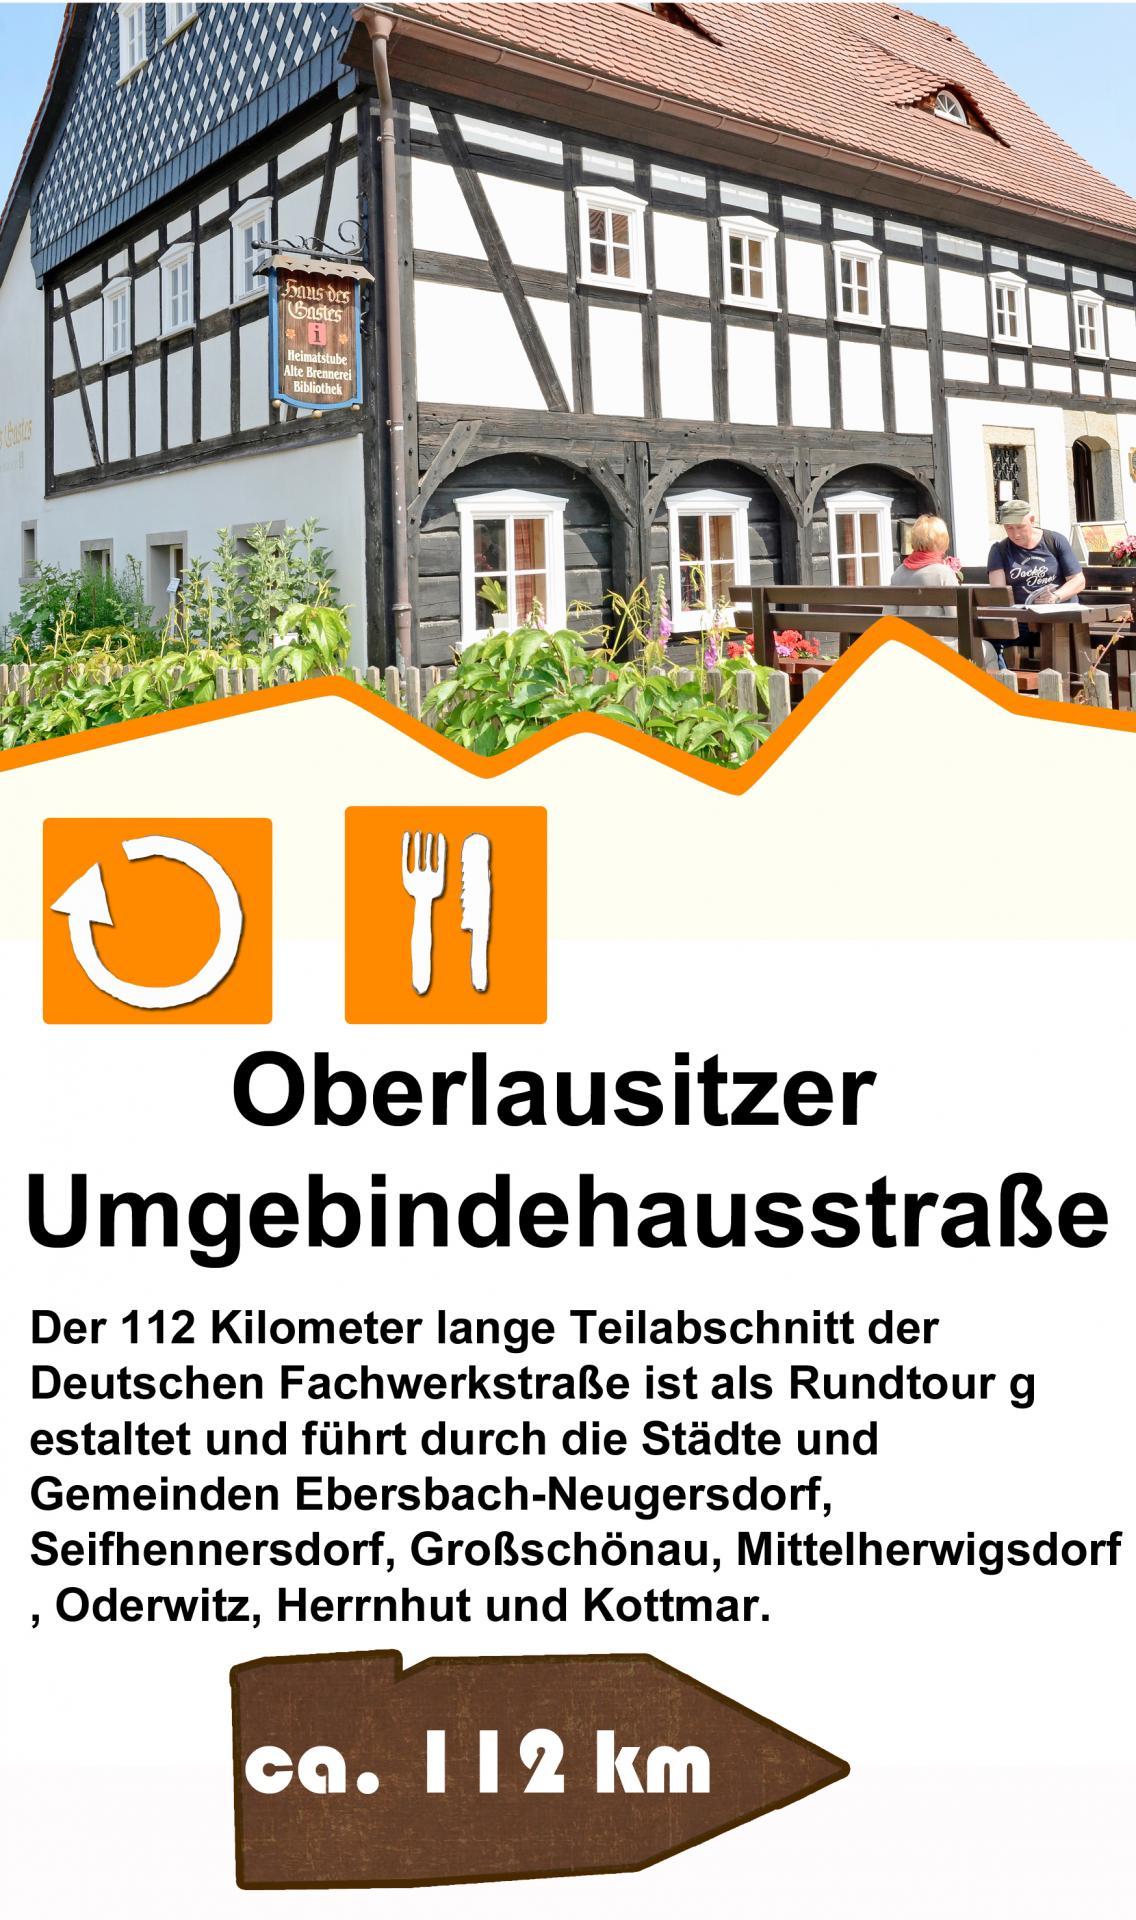 Oberlausitzer Umgebindehausstraße